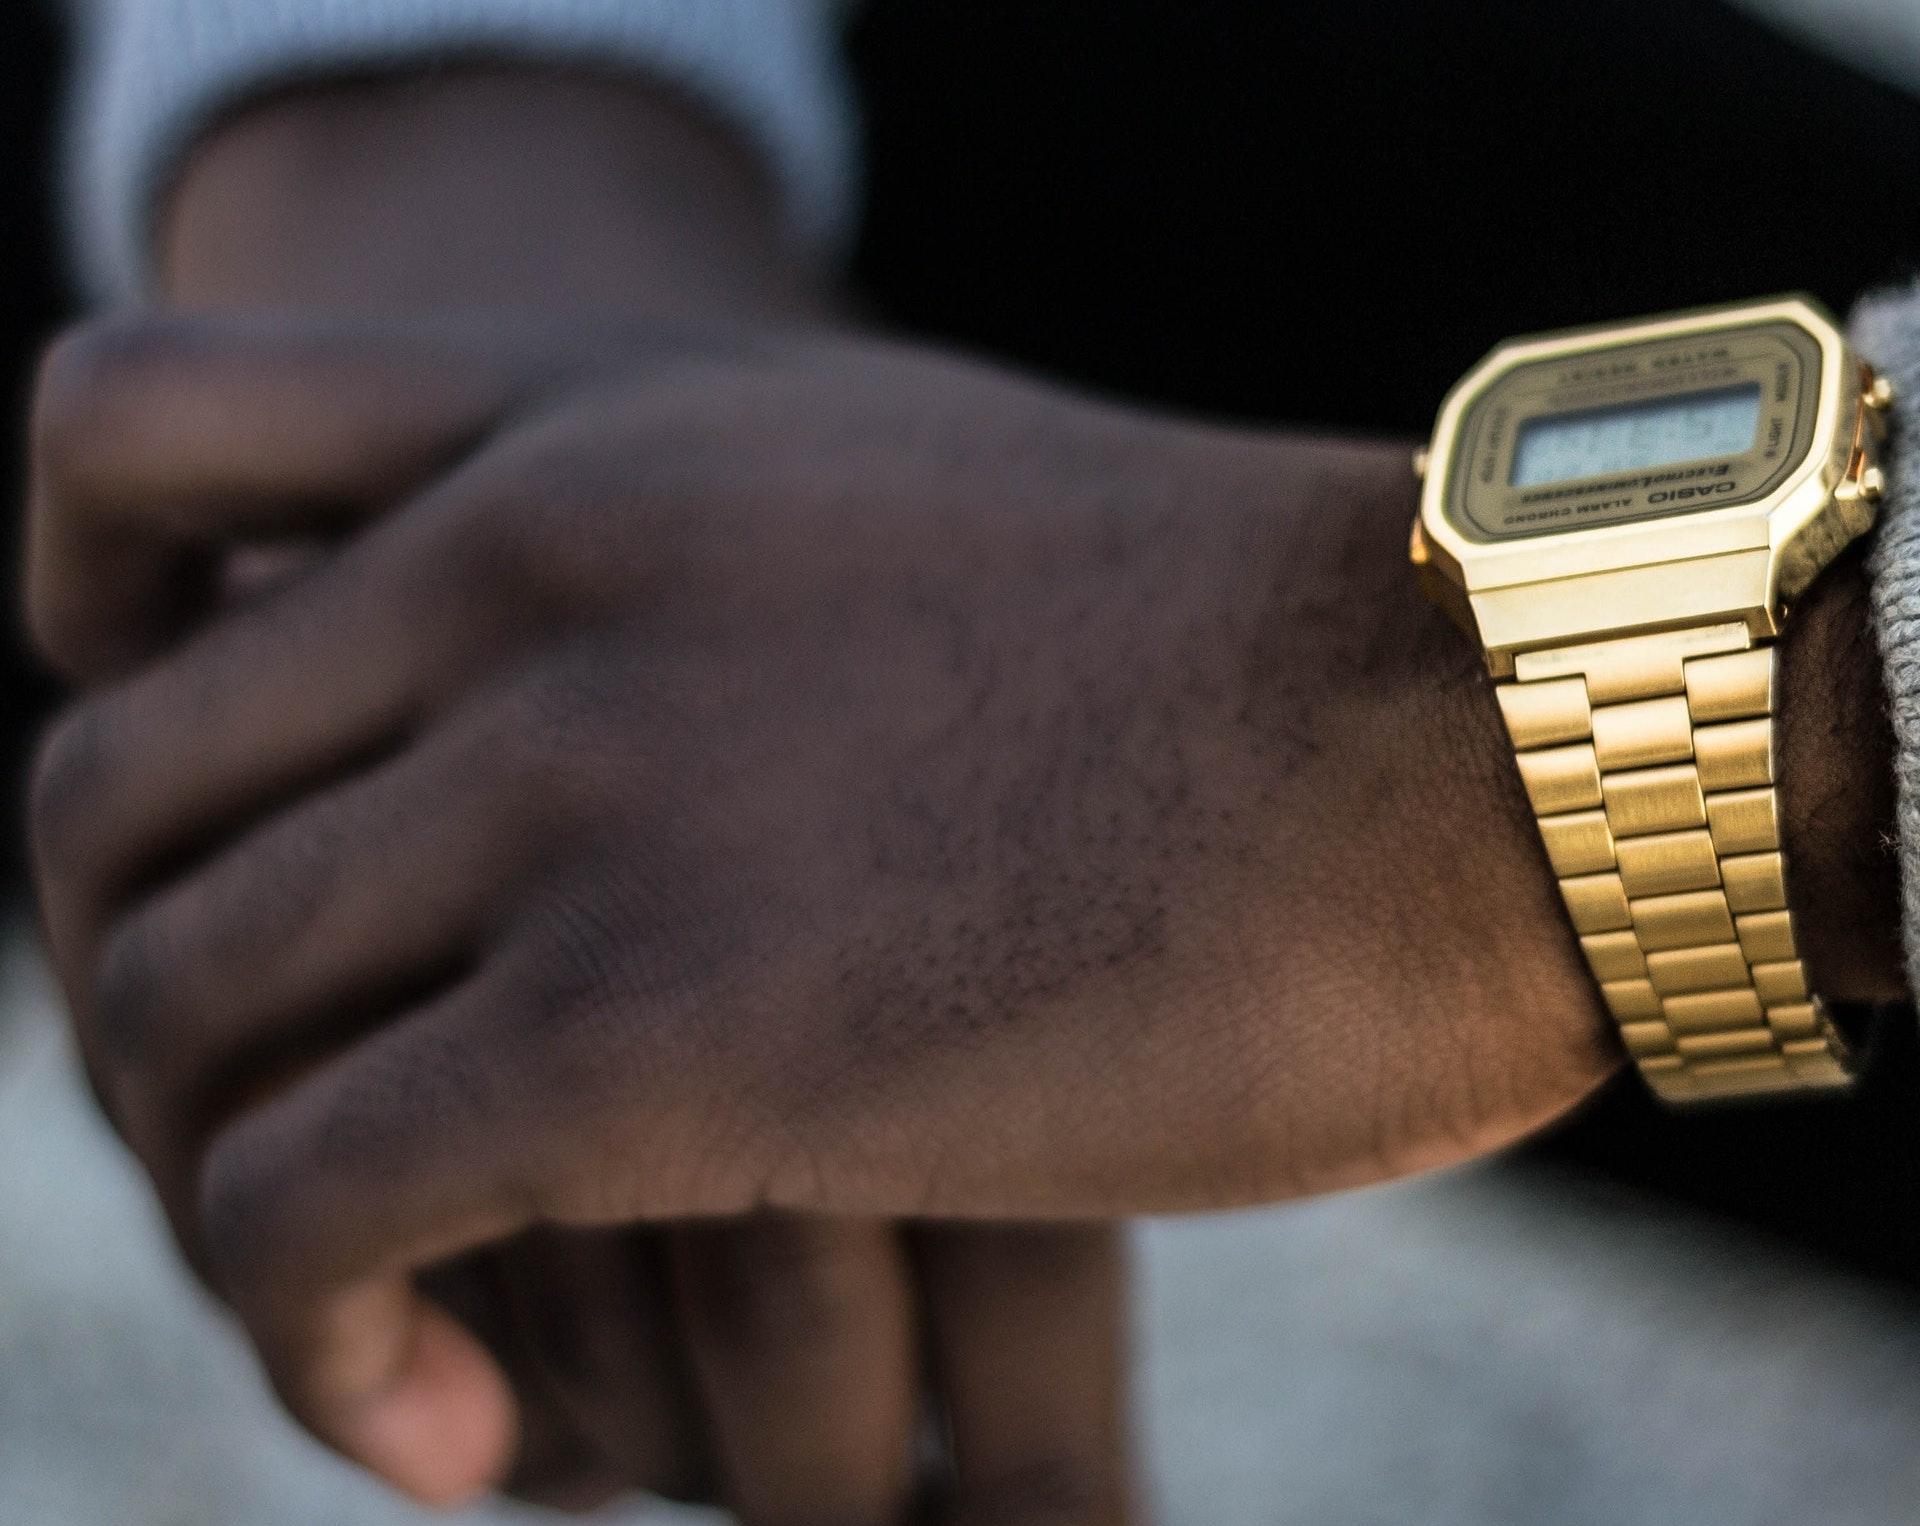 Gold-casio-digital-watch